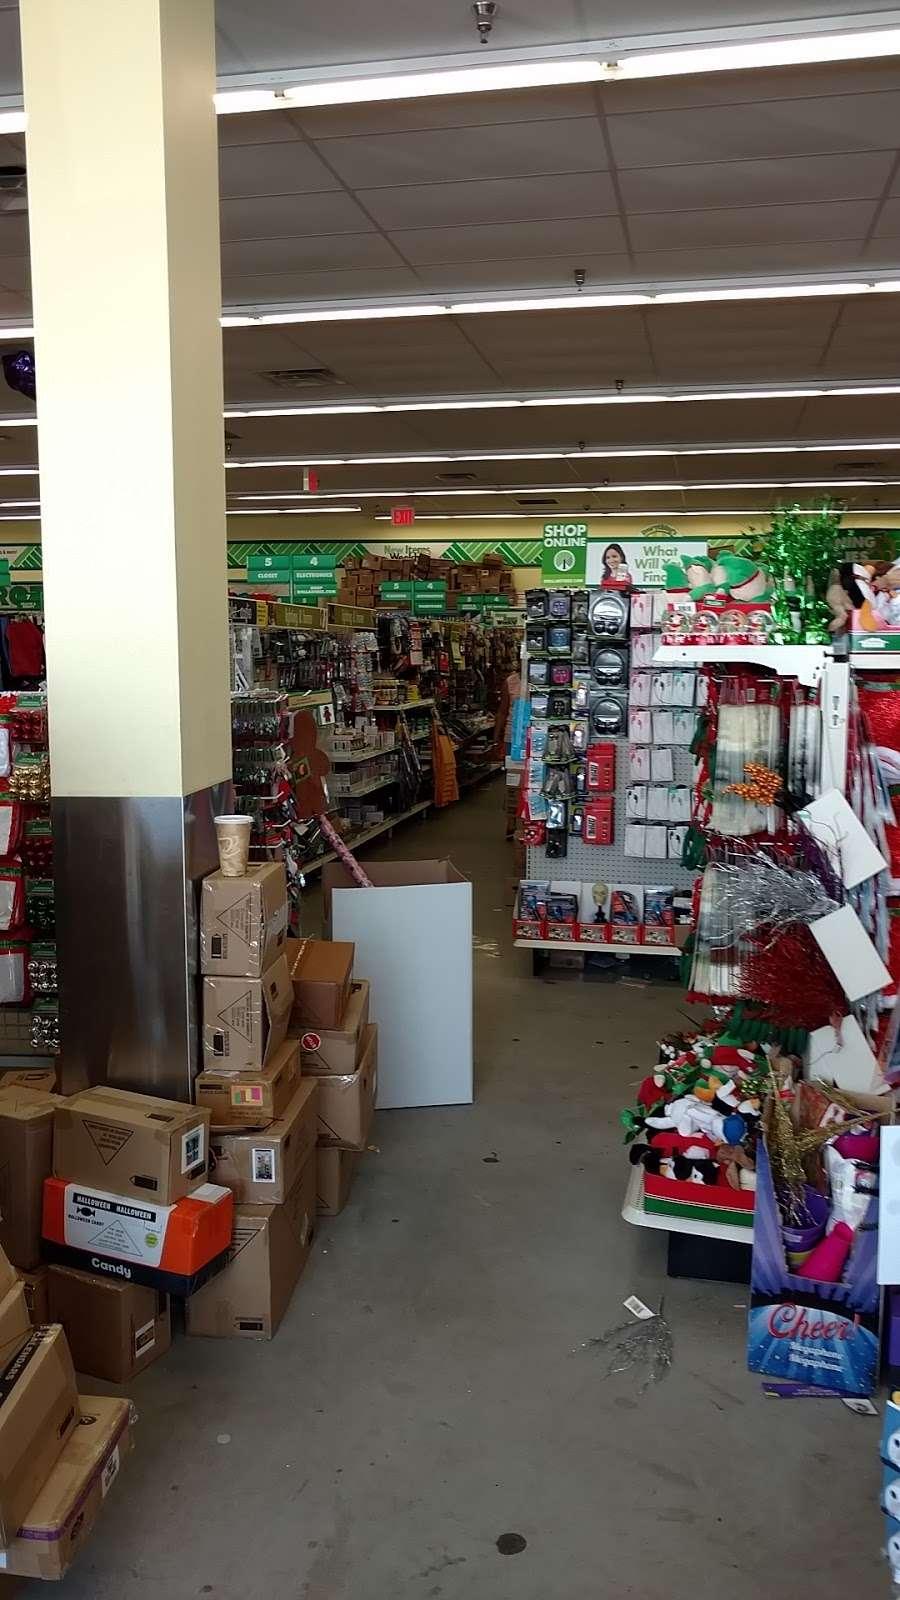 Dollar Tree - furniture store  | Photo 9 of 10 | Address: 248-56 Rockaway Blvd, Rosedale, NY 11422, USA | Phone: (718) 990-8948